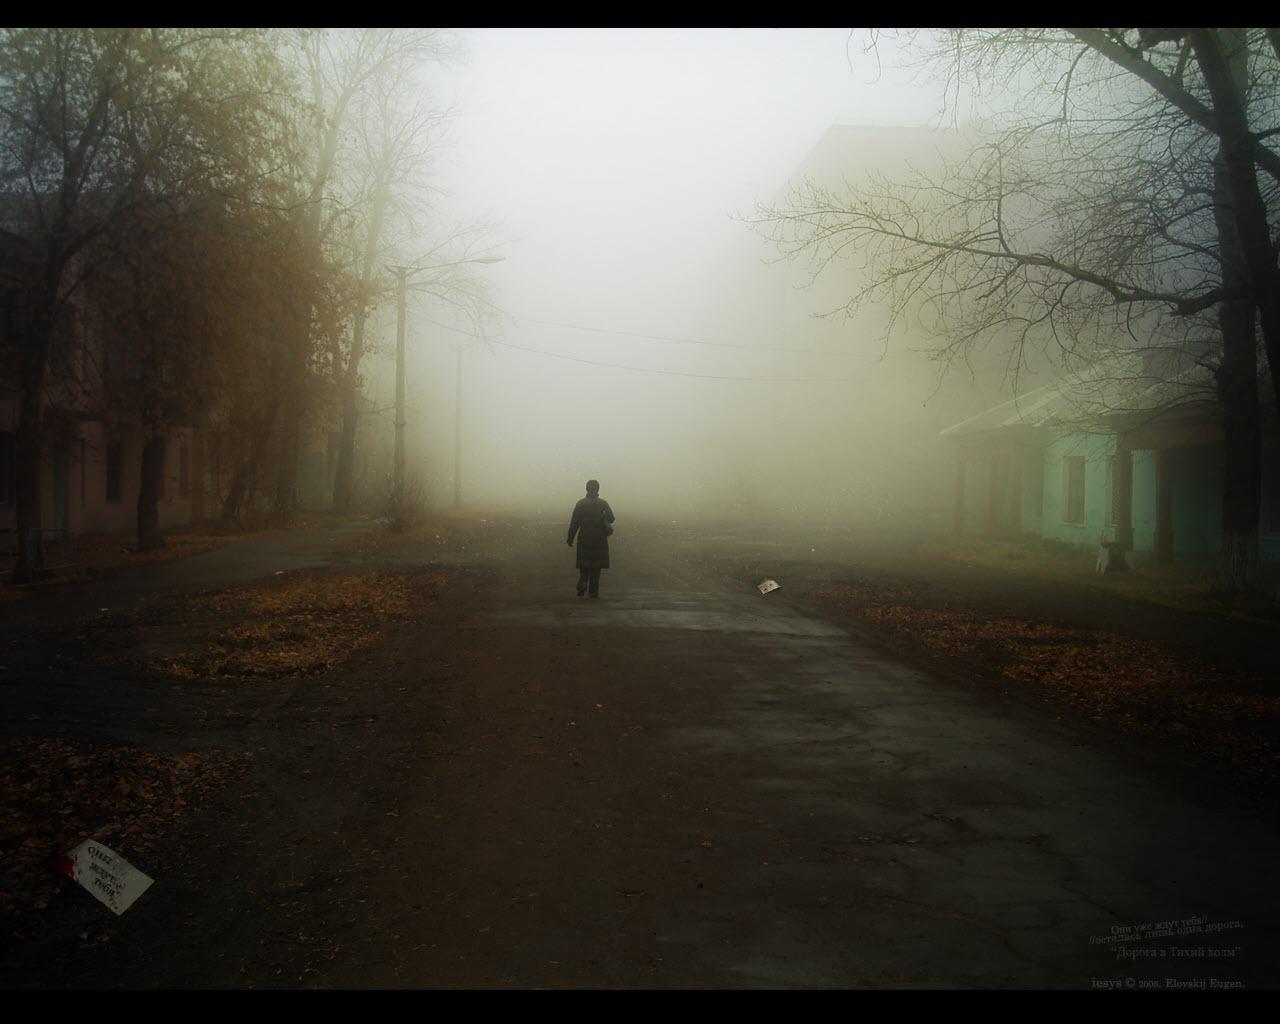 I Am Alone Wallpaper - WallpaperSafari